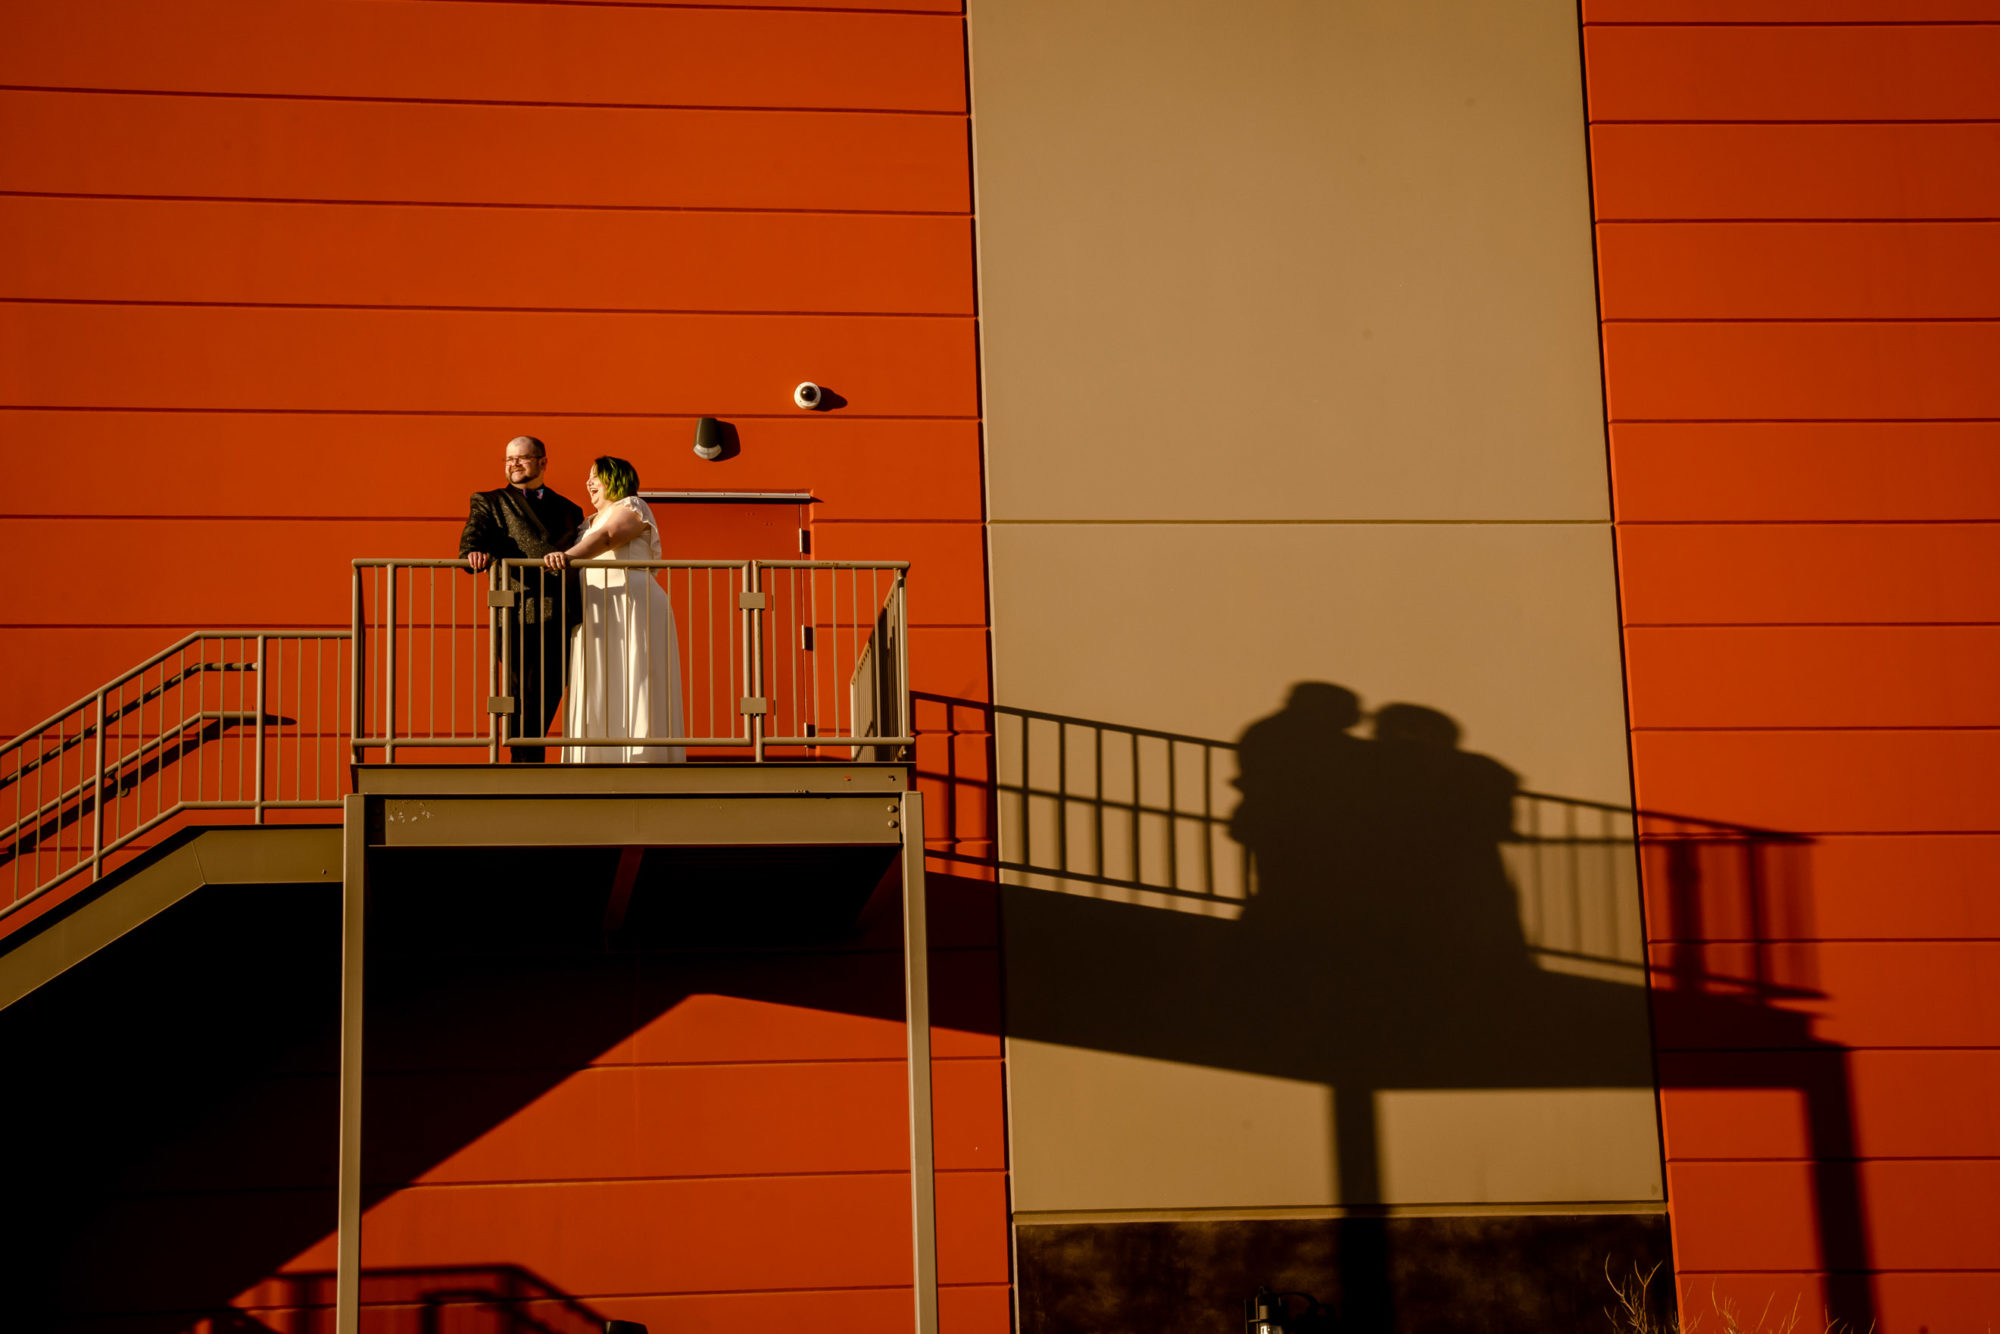 wedding at the movies